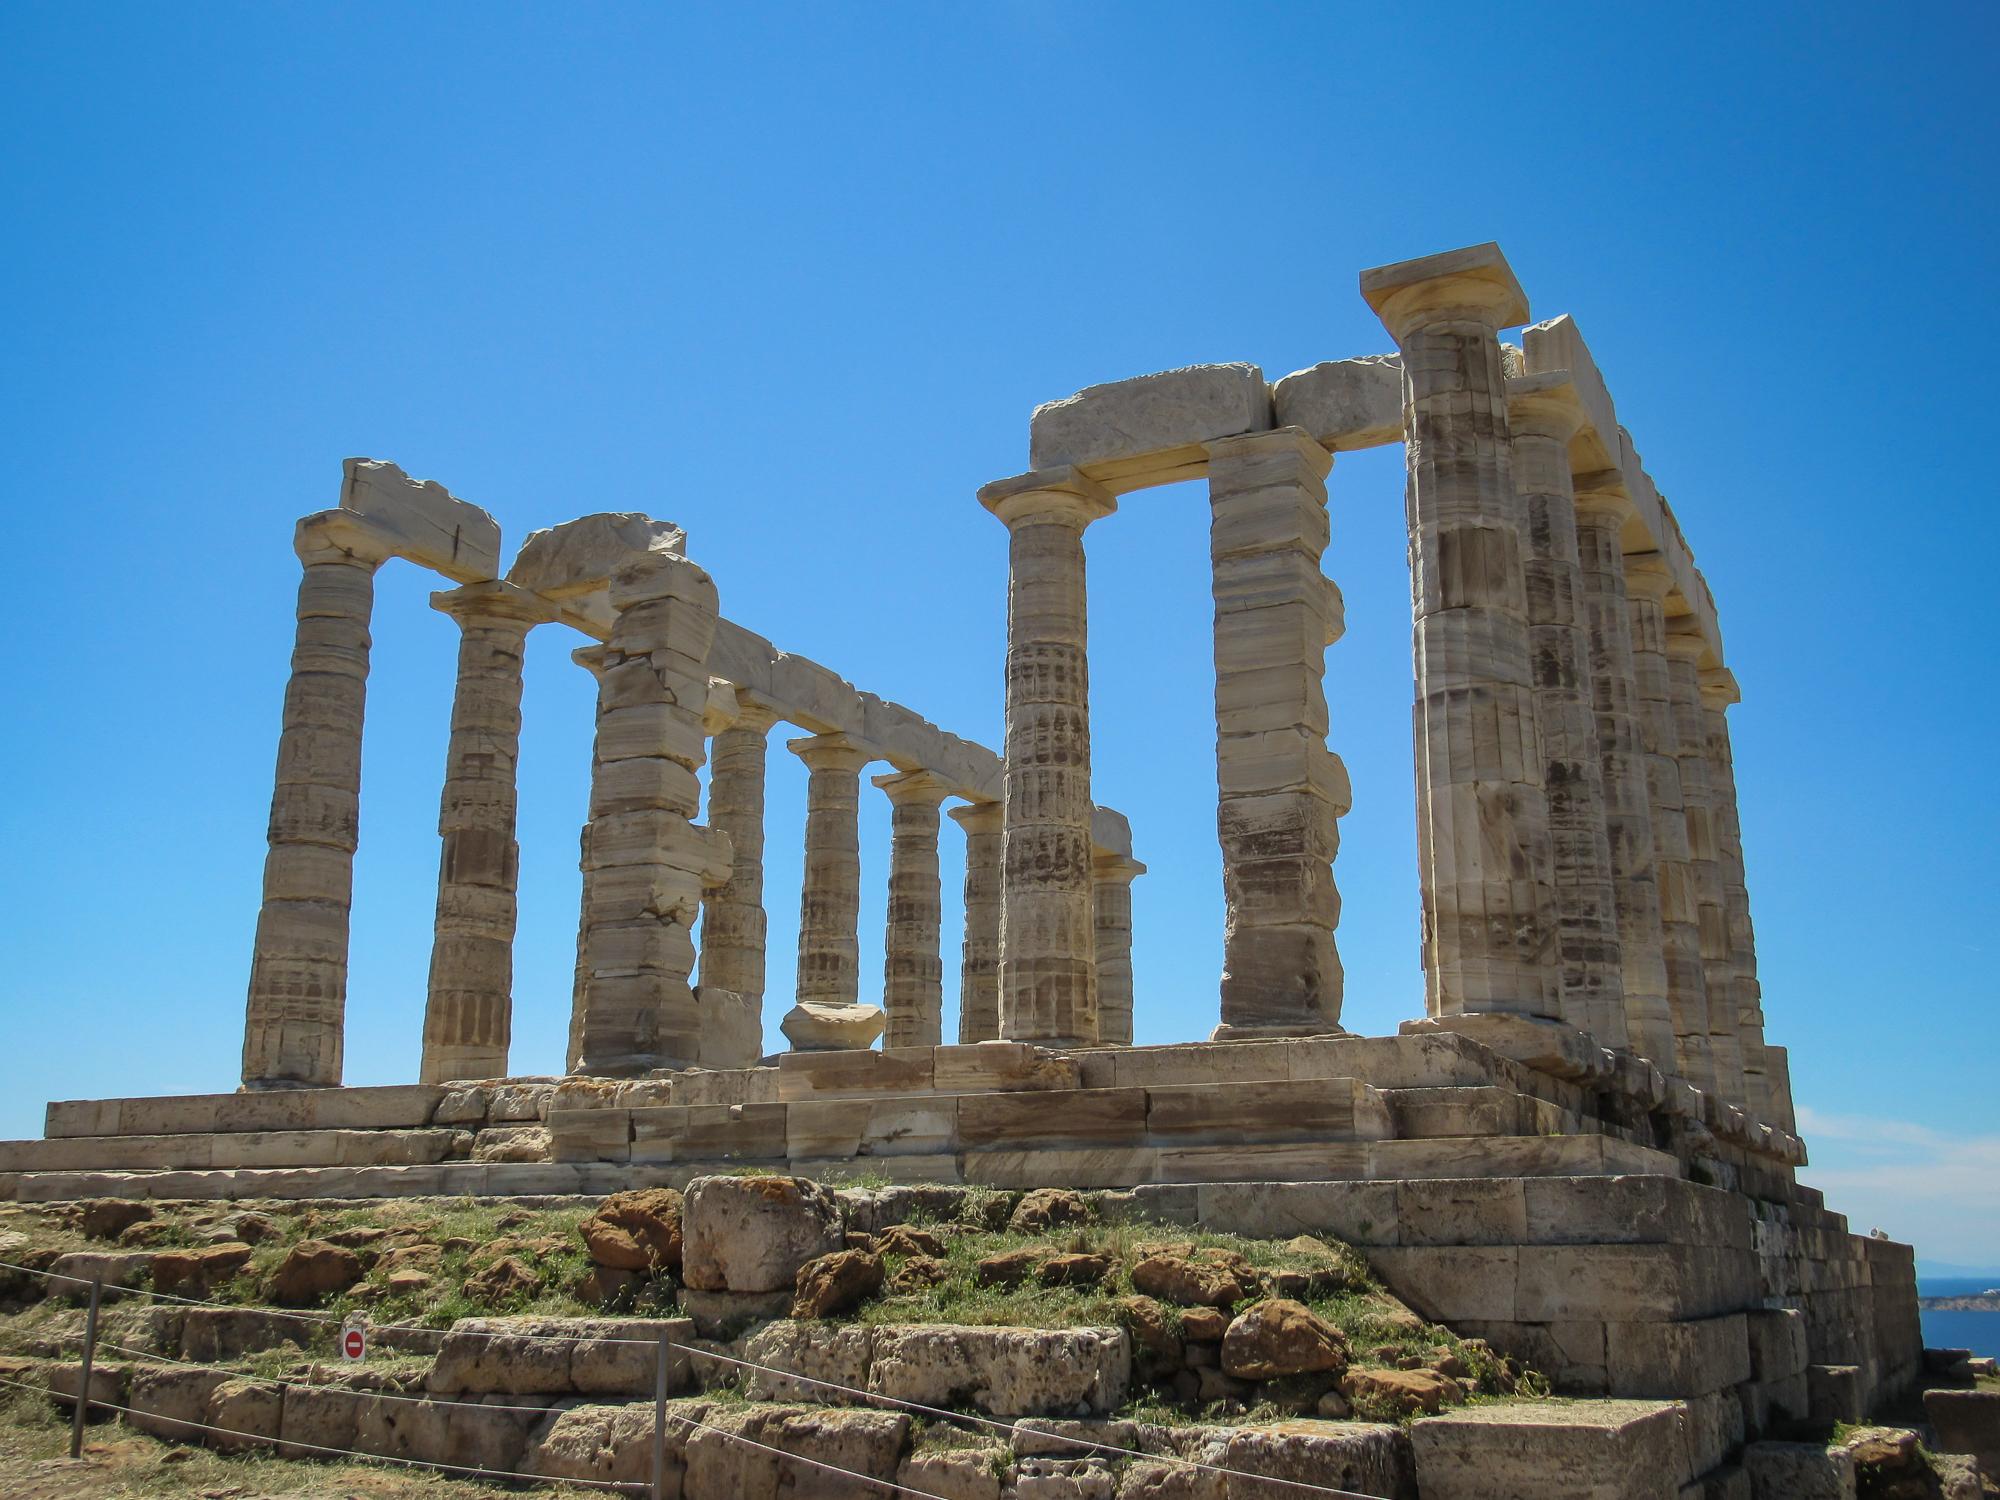 Temple Poseidon at Cap Sounion